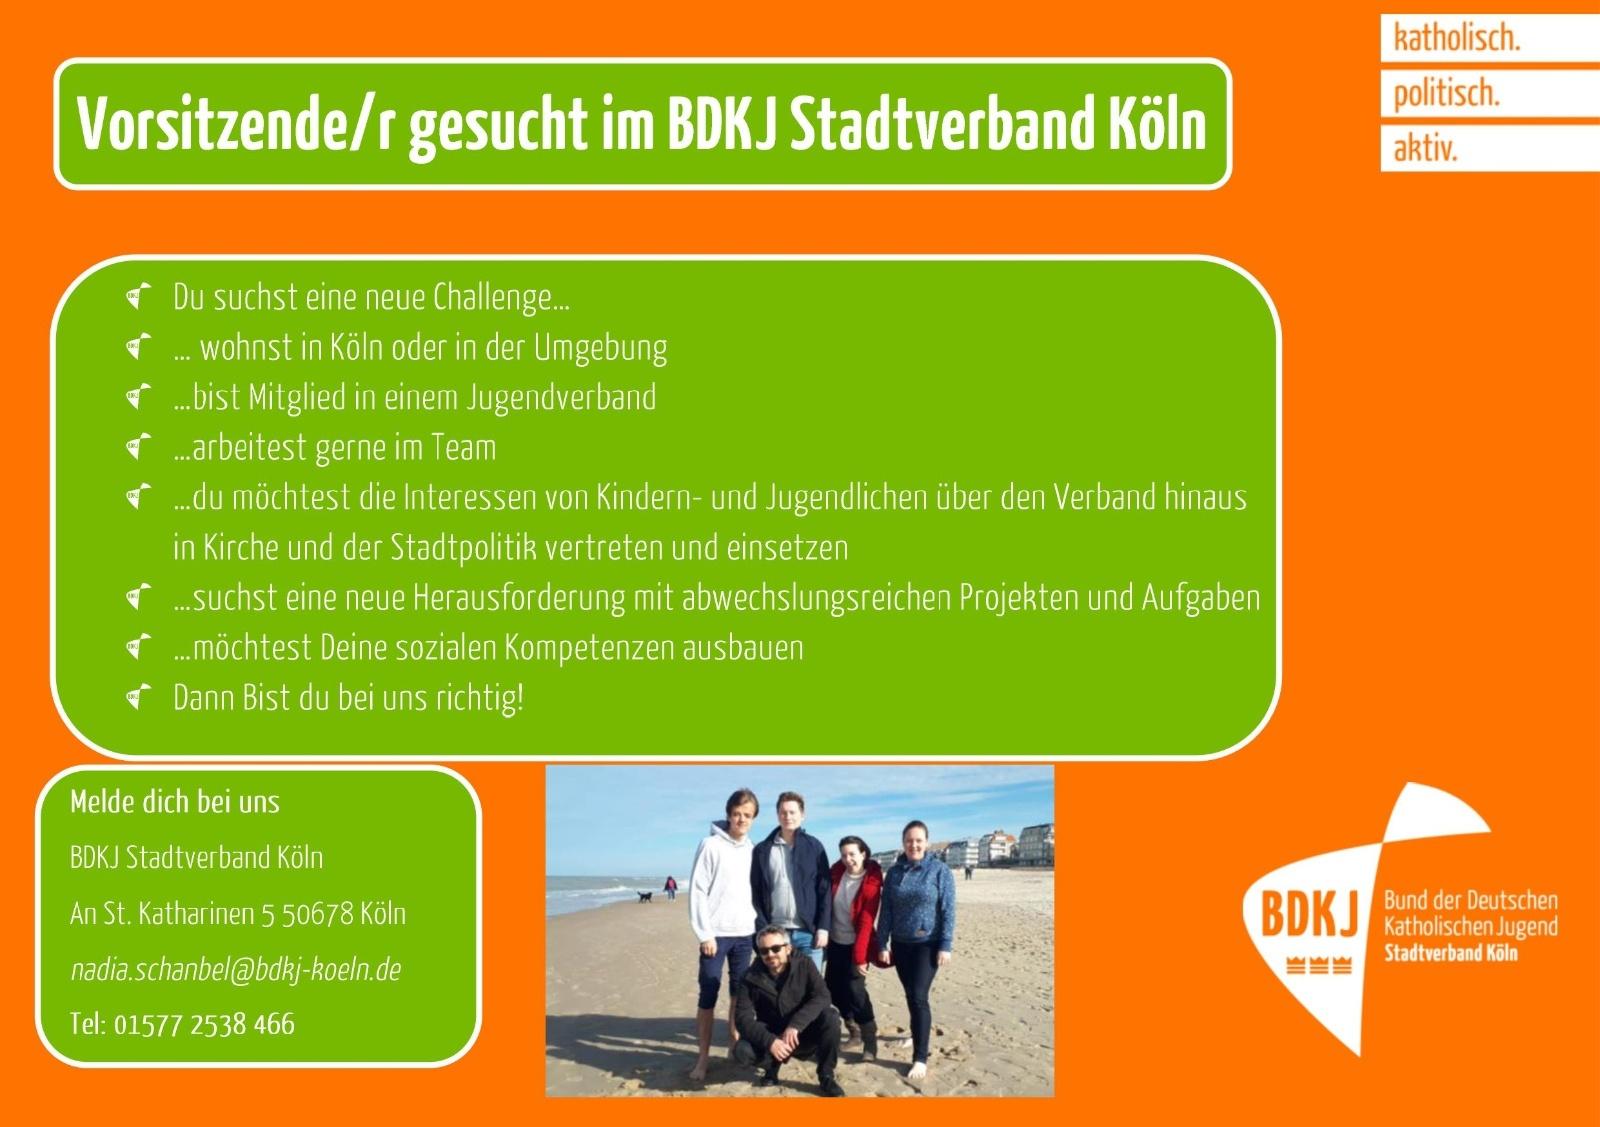 BDKJ Köln   Vorsitzende*r gesucht im BDKJ Stadtverband Köln